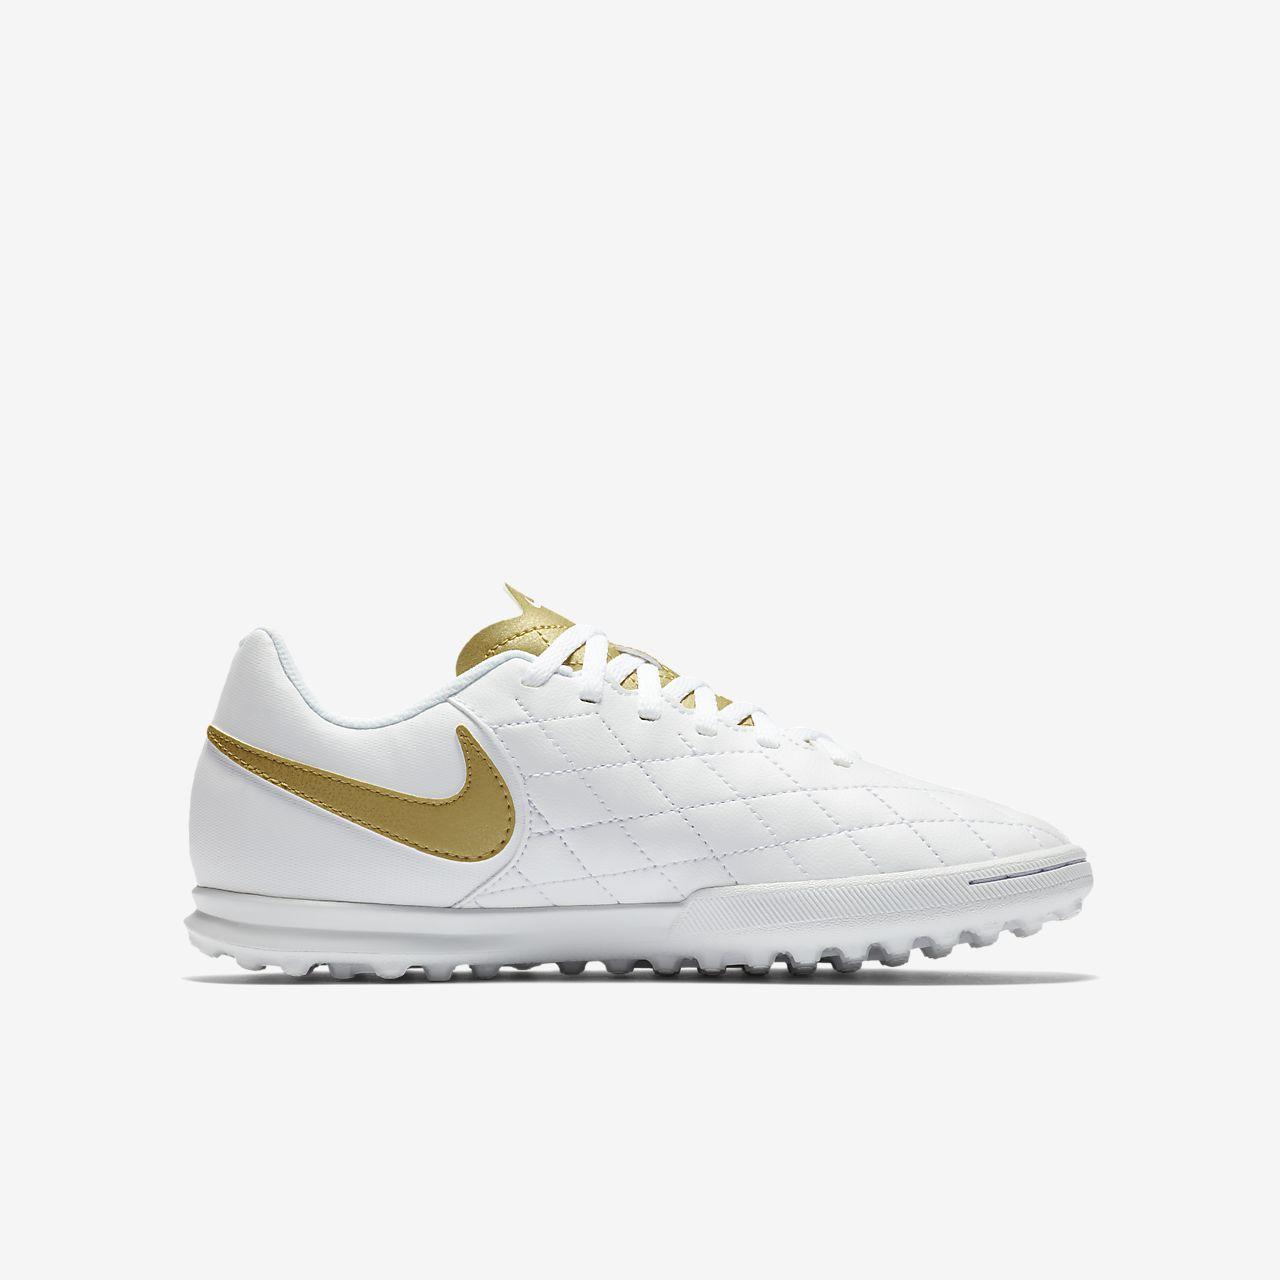 online store 6cfbf 83518 Nike Jr TiempoX Legend VII Club 10R Younger/Older Kids' Turf Football Shoe